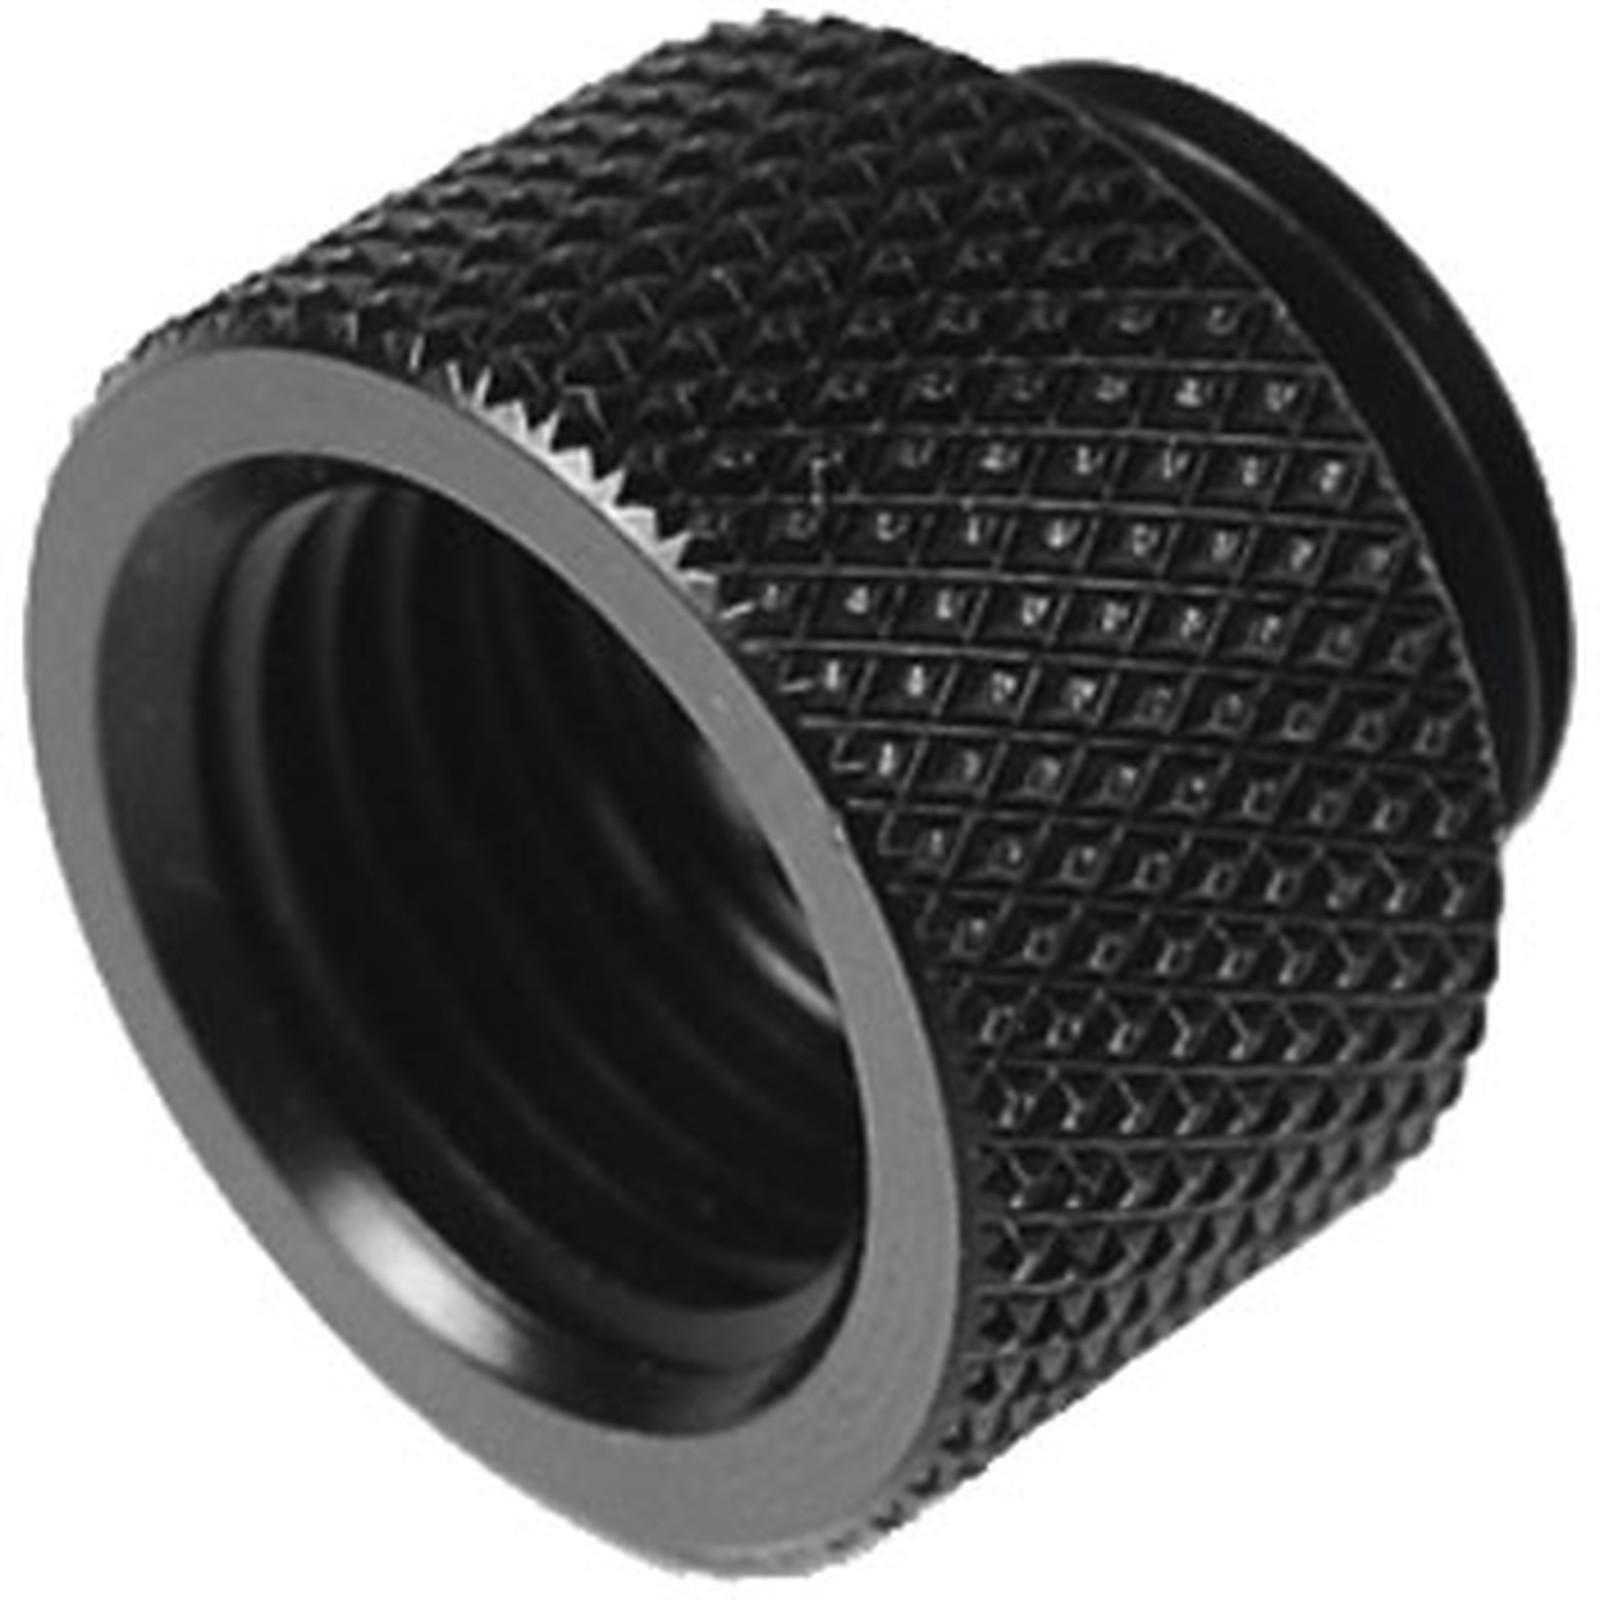 Barrow Extension mâle vers femelle 10 mm - Noir